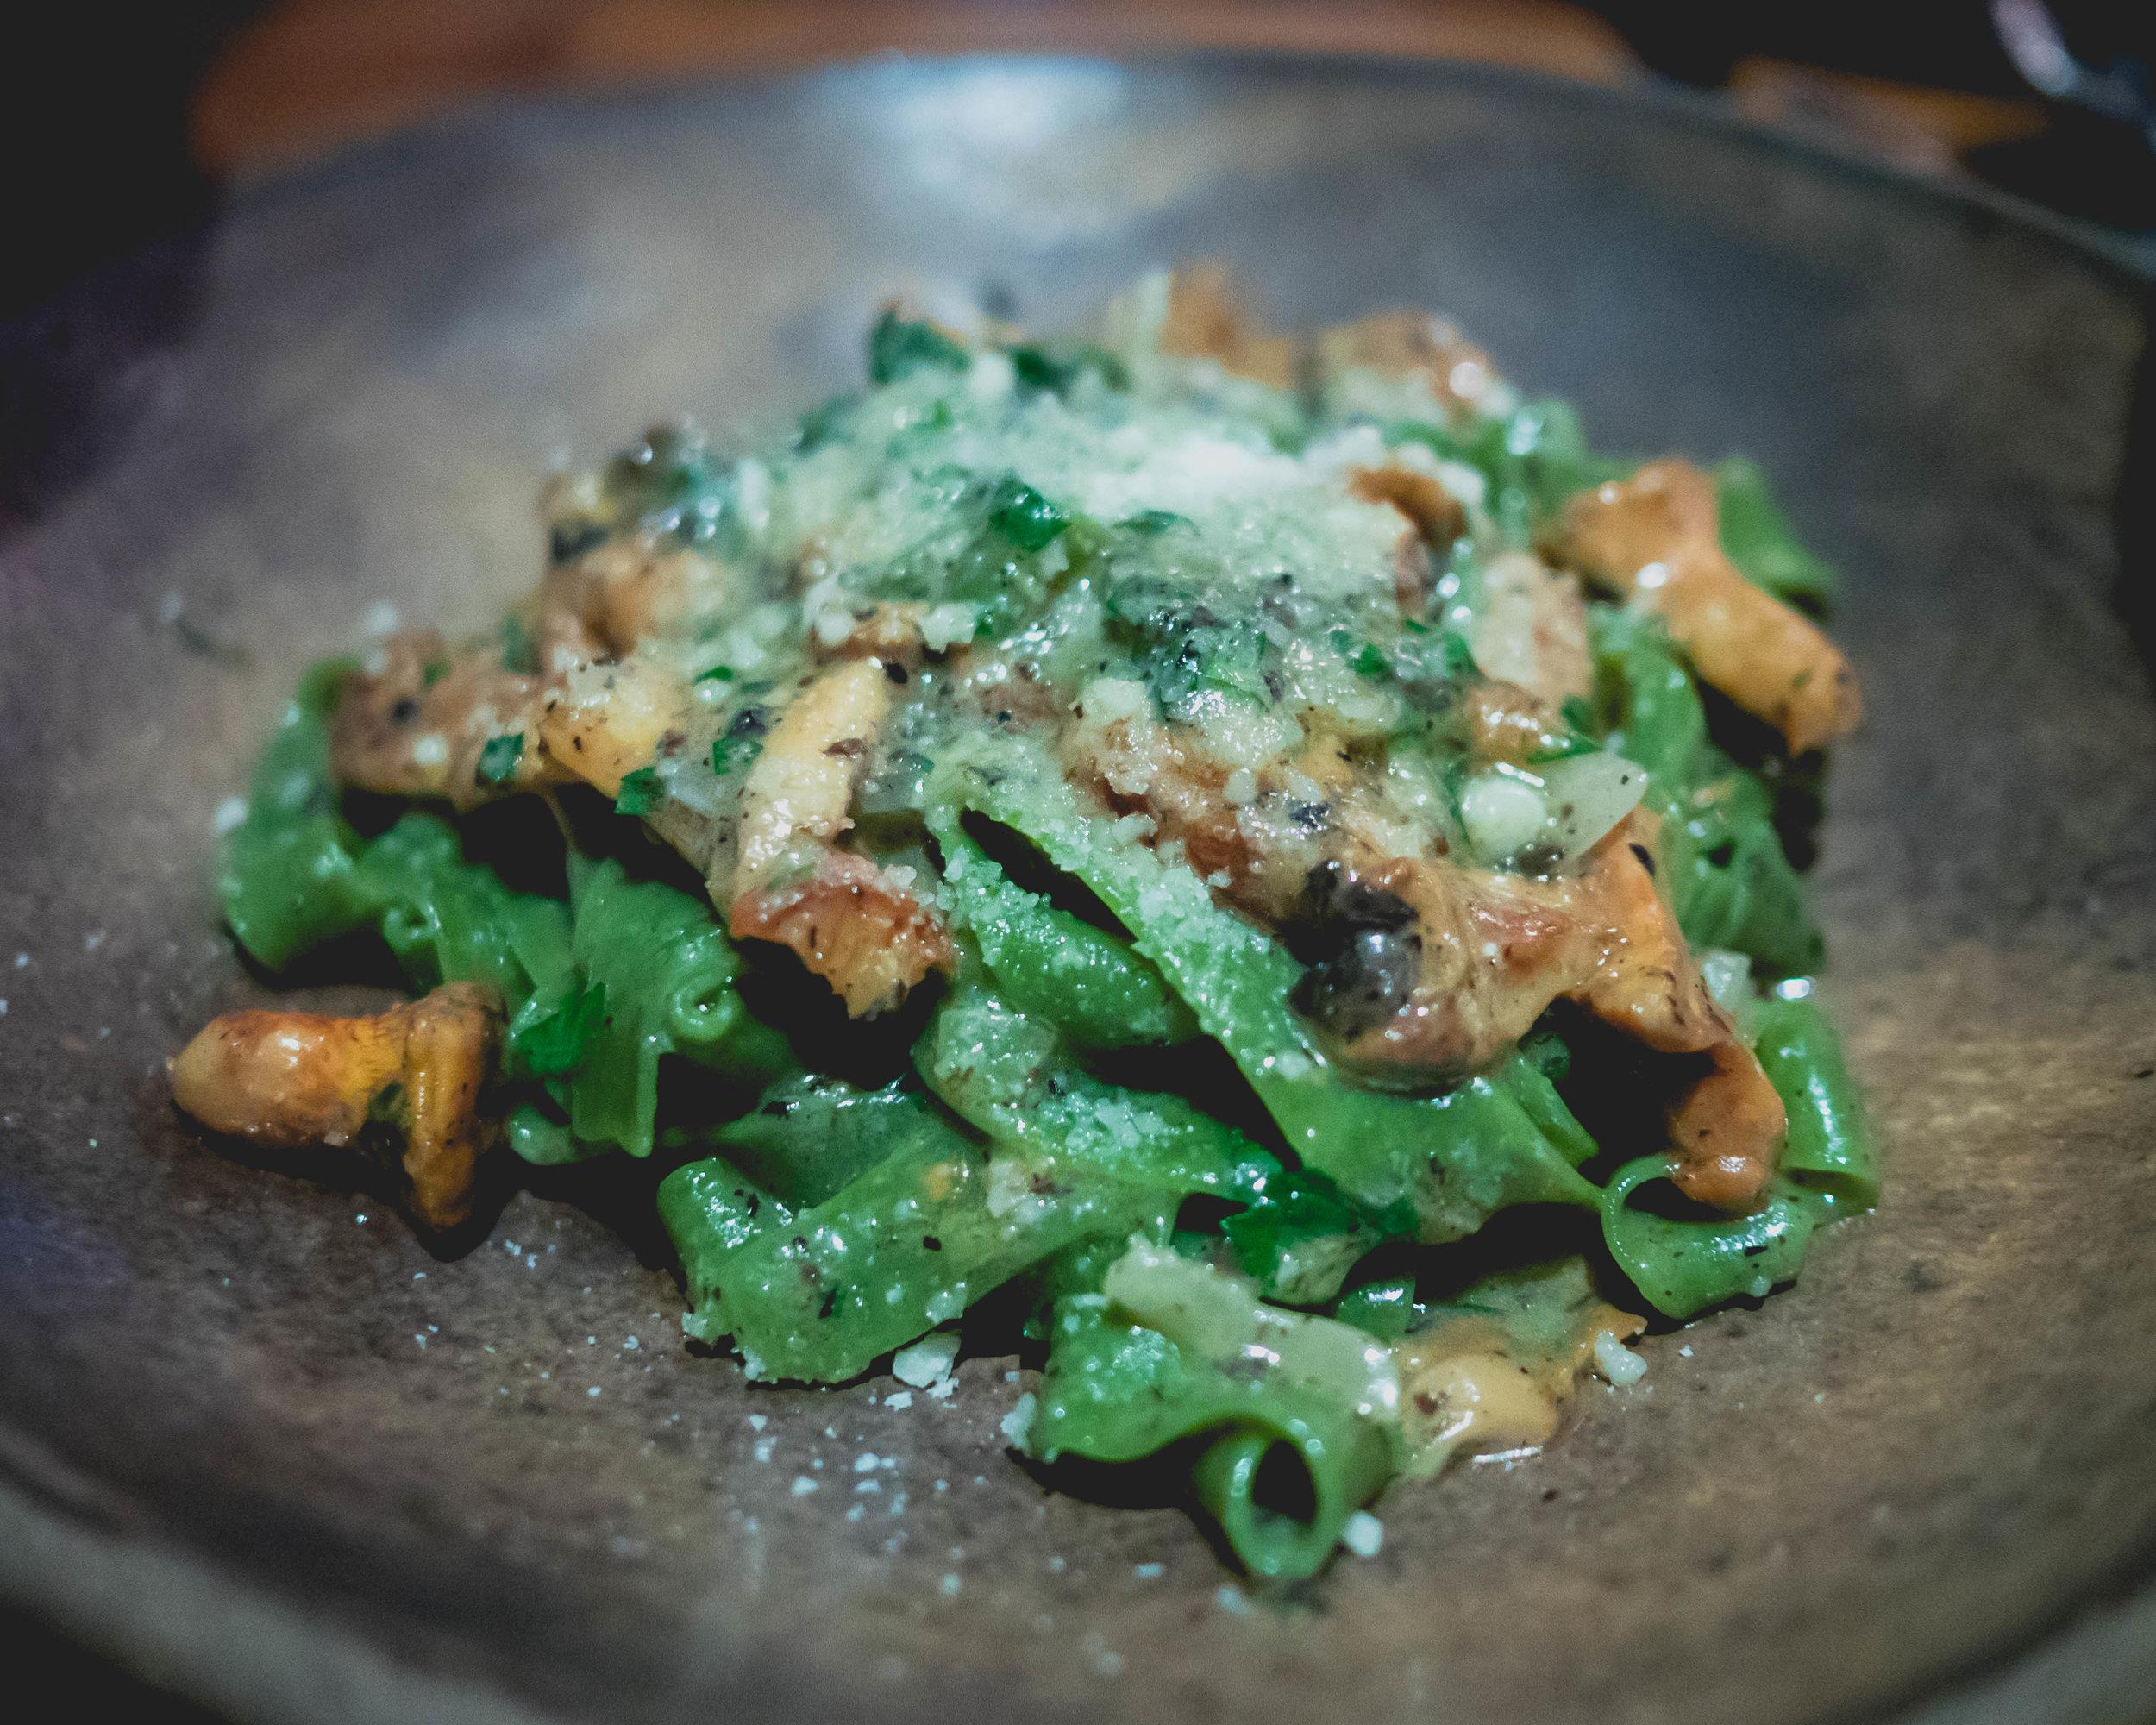 spinach tagliatelle , tartufata, wild porcini mushrooms, spring onions, parsley.